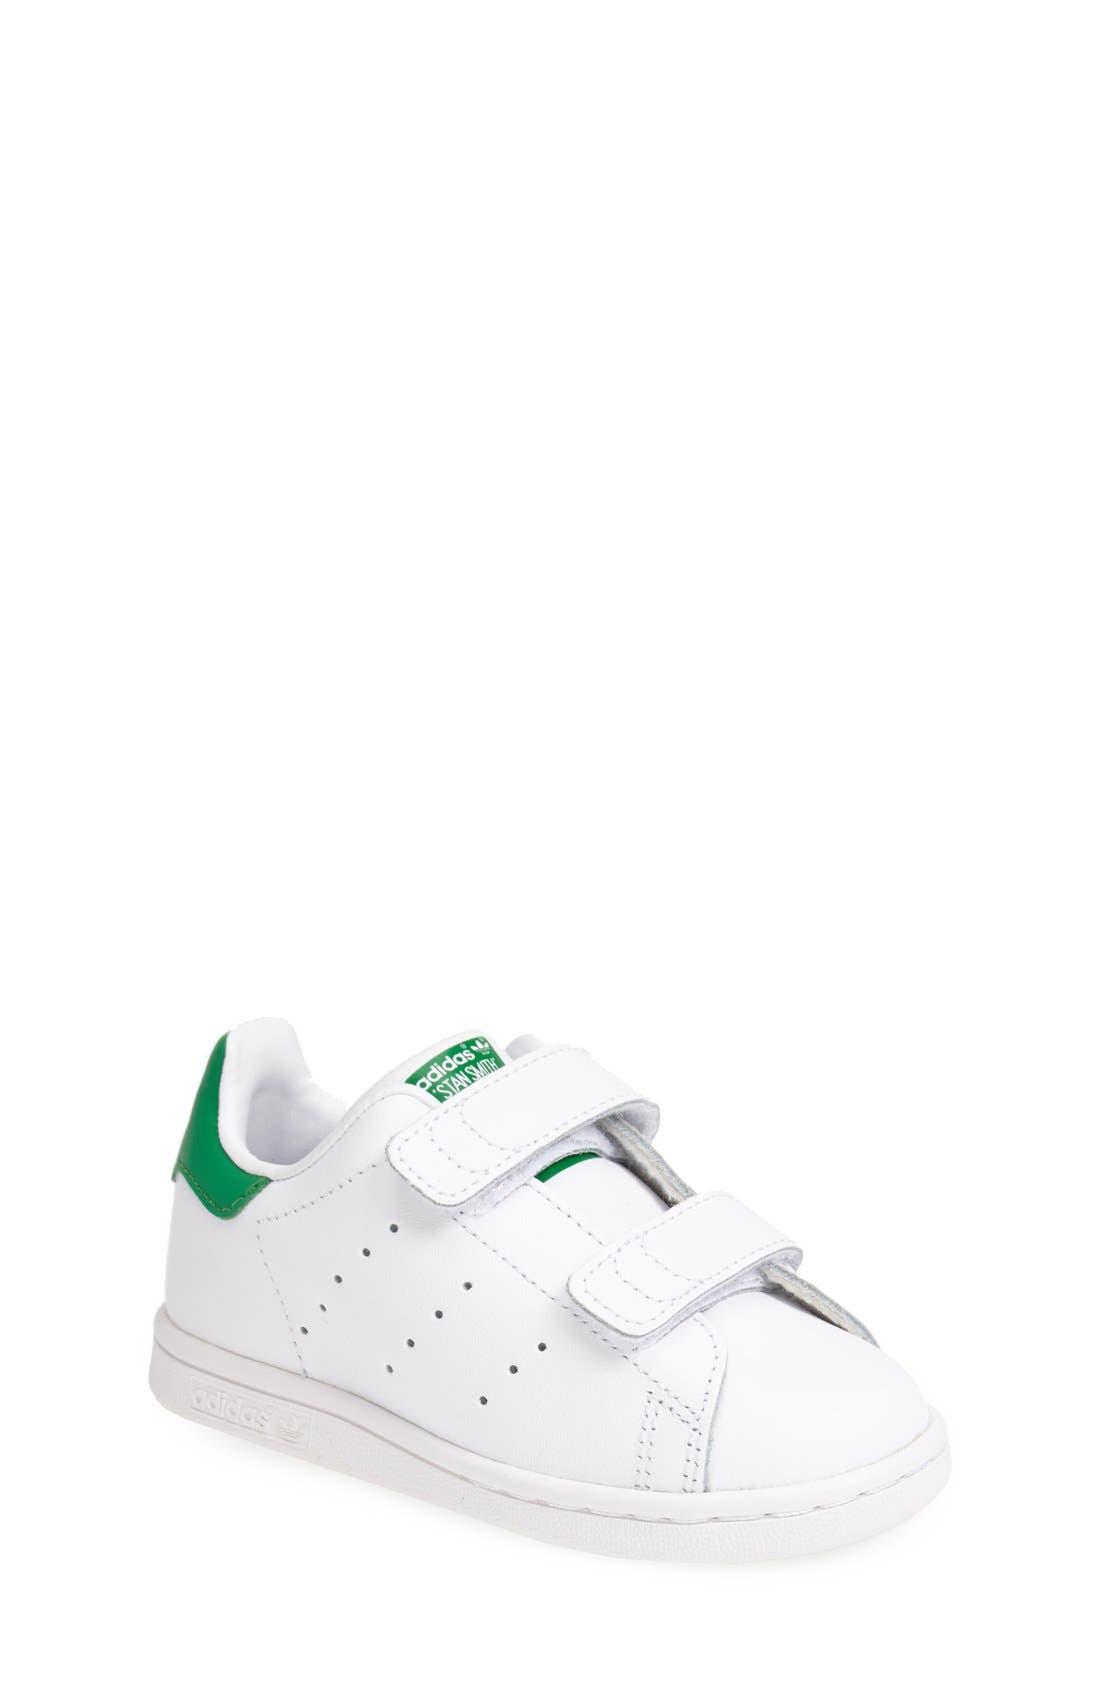 adidas 'Stan Smith' Leather Sneaker